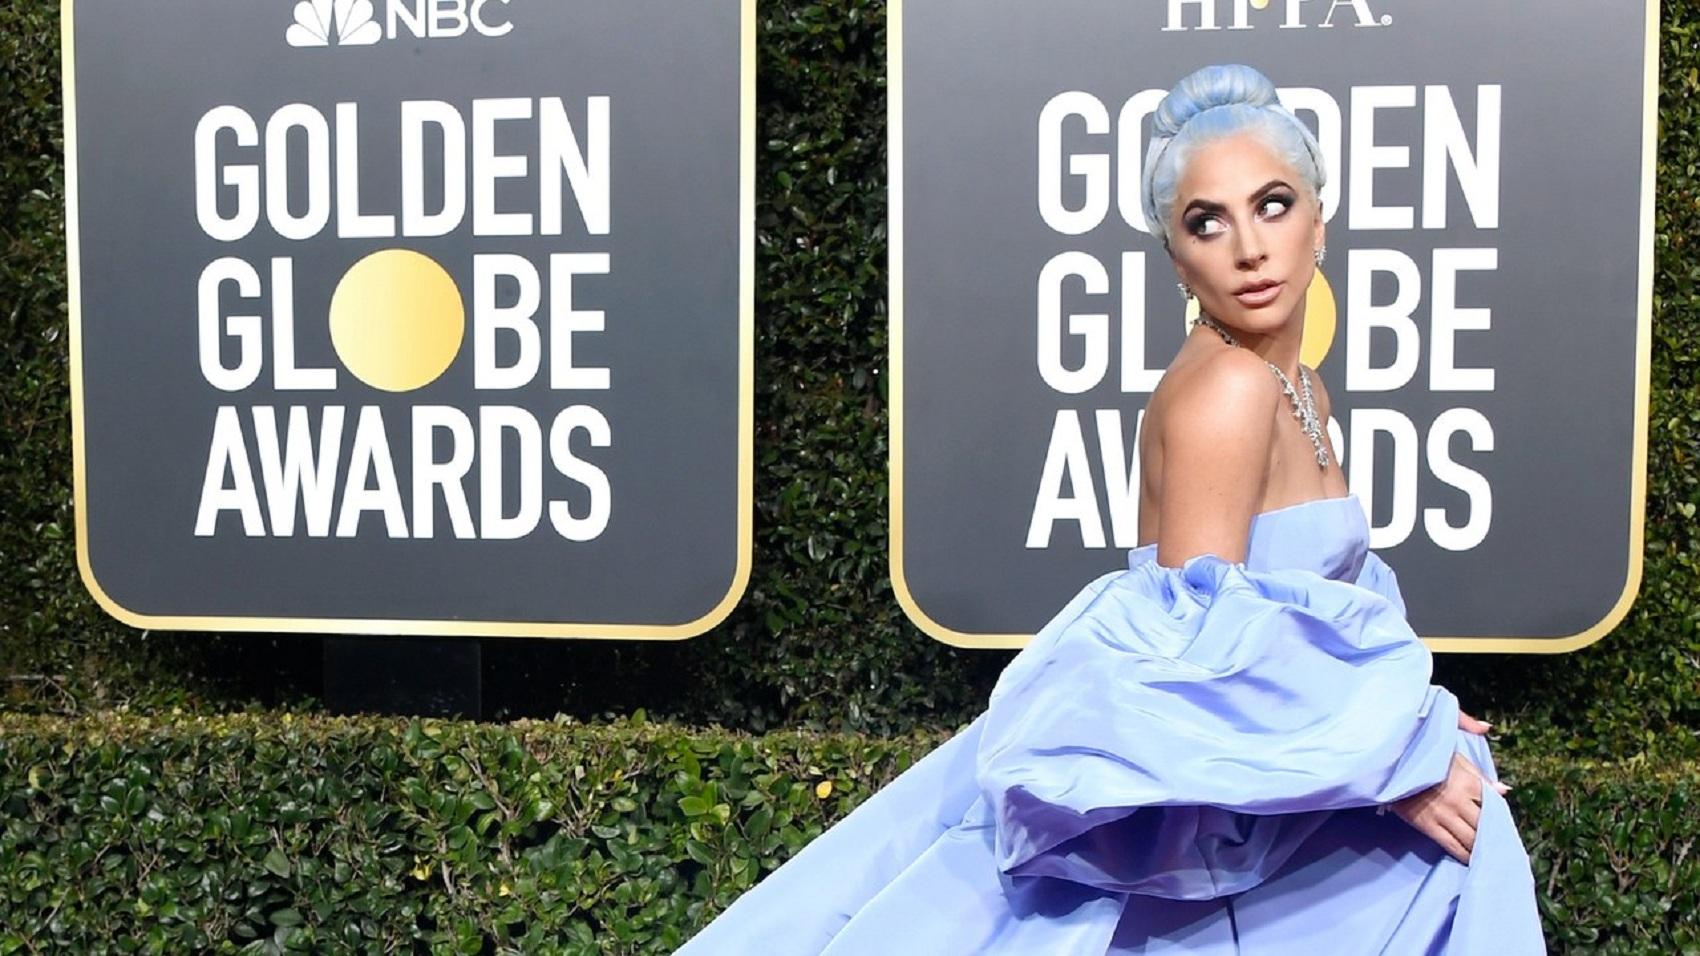 Golden Globe A star is born